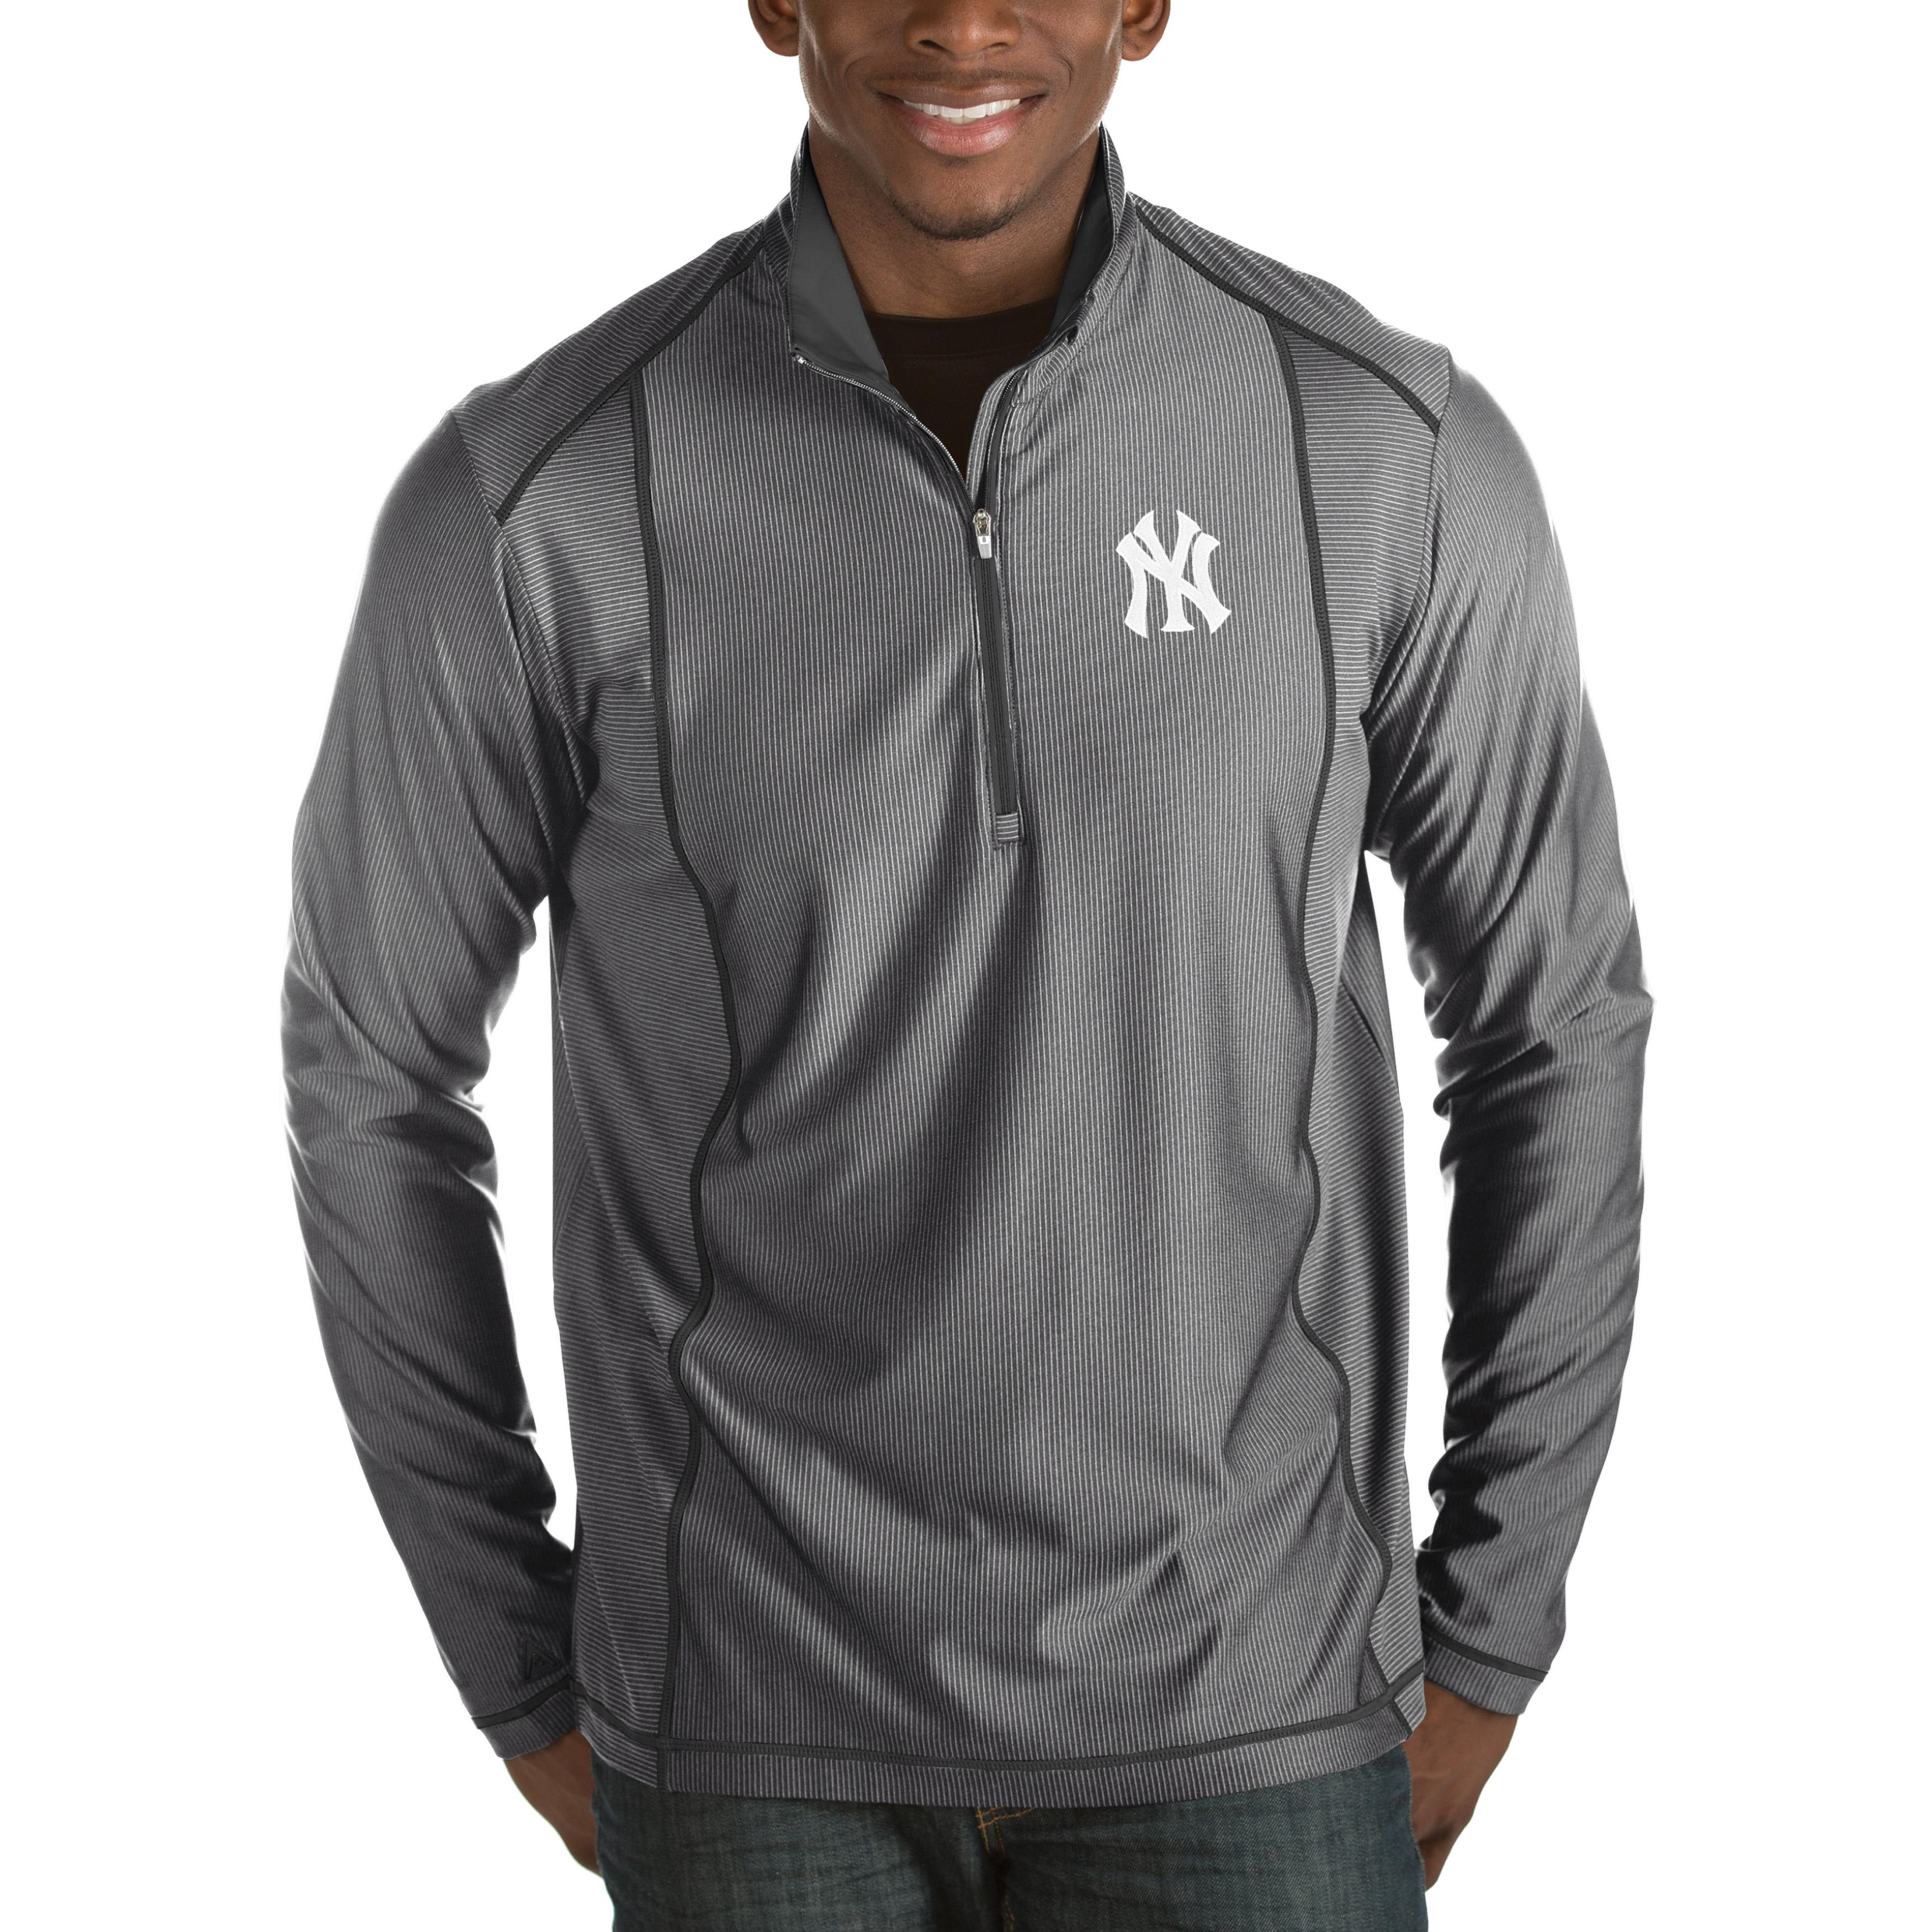 New York Yankees Antigua Tempo Half-Zip Pullover Jacket - Heathered Charcoal